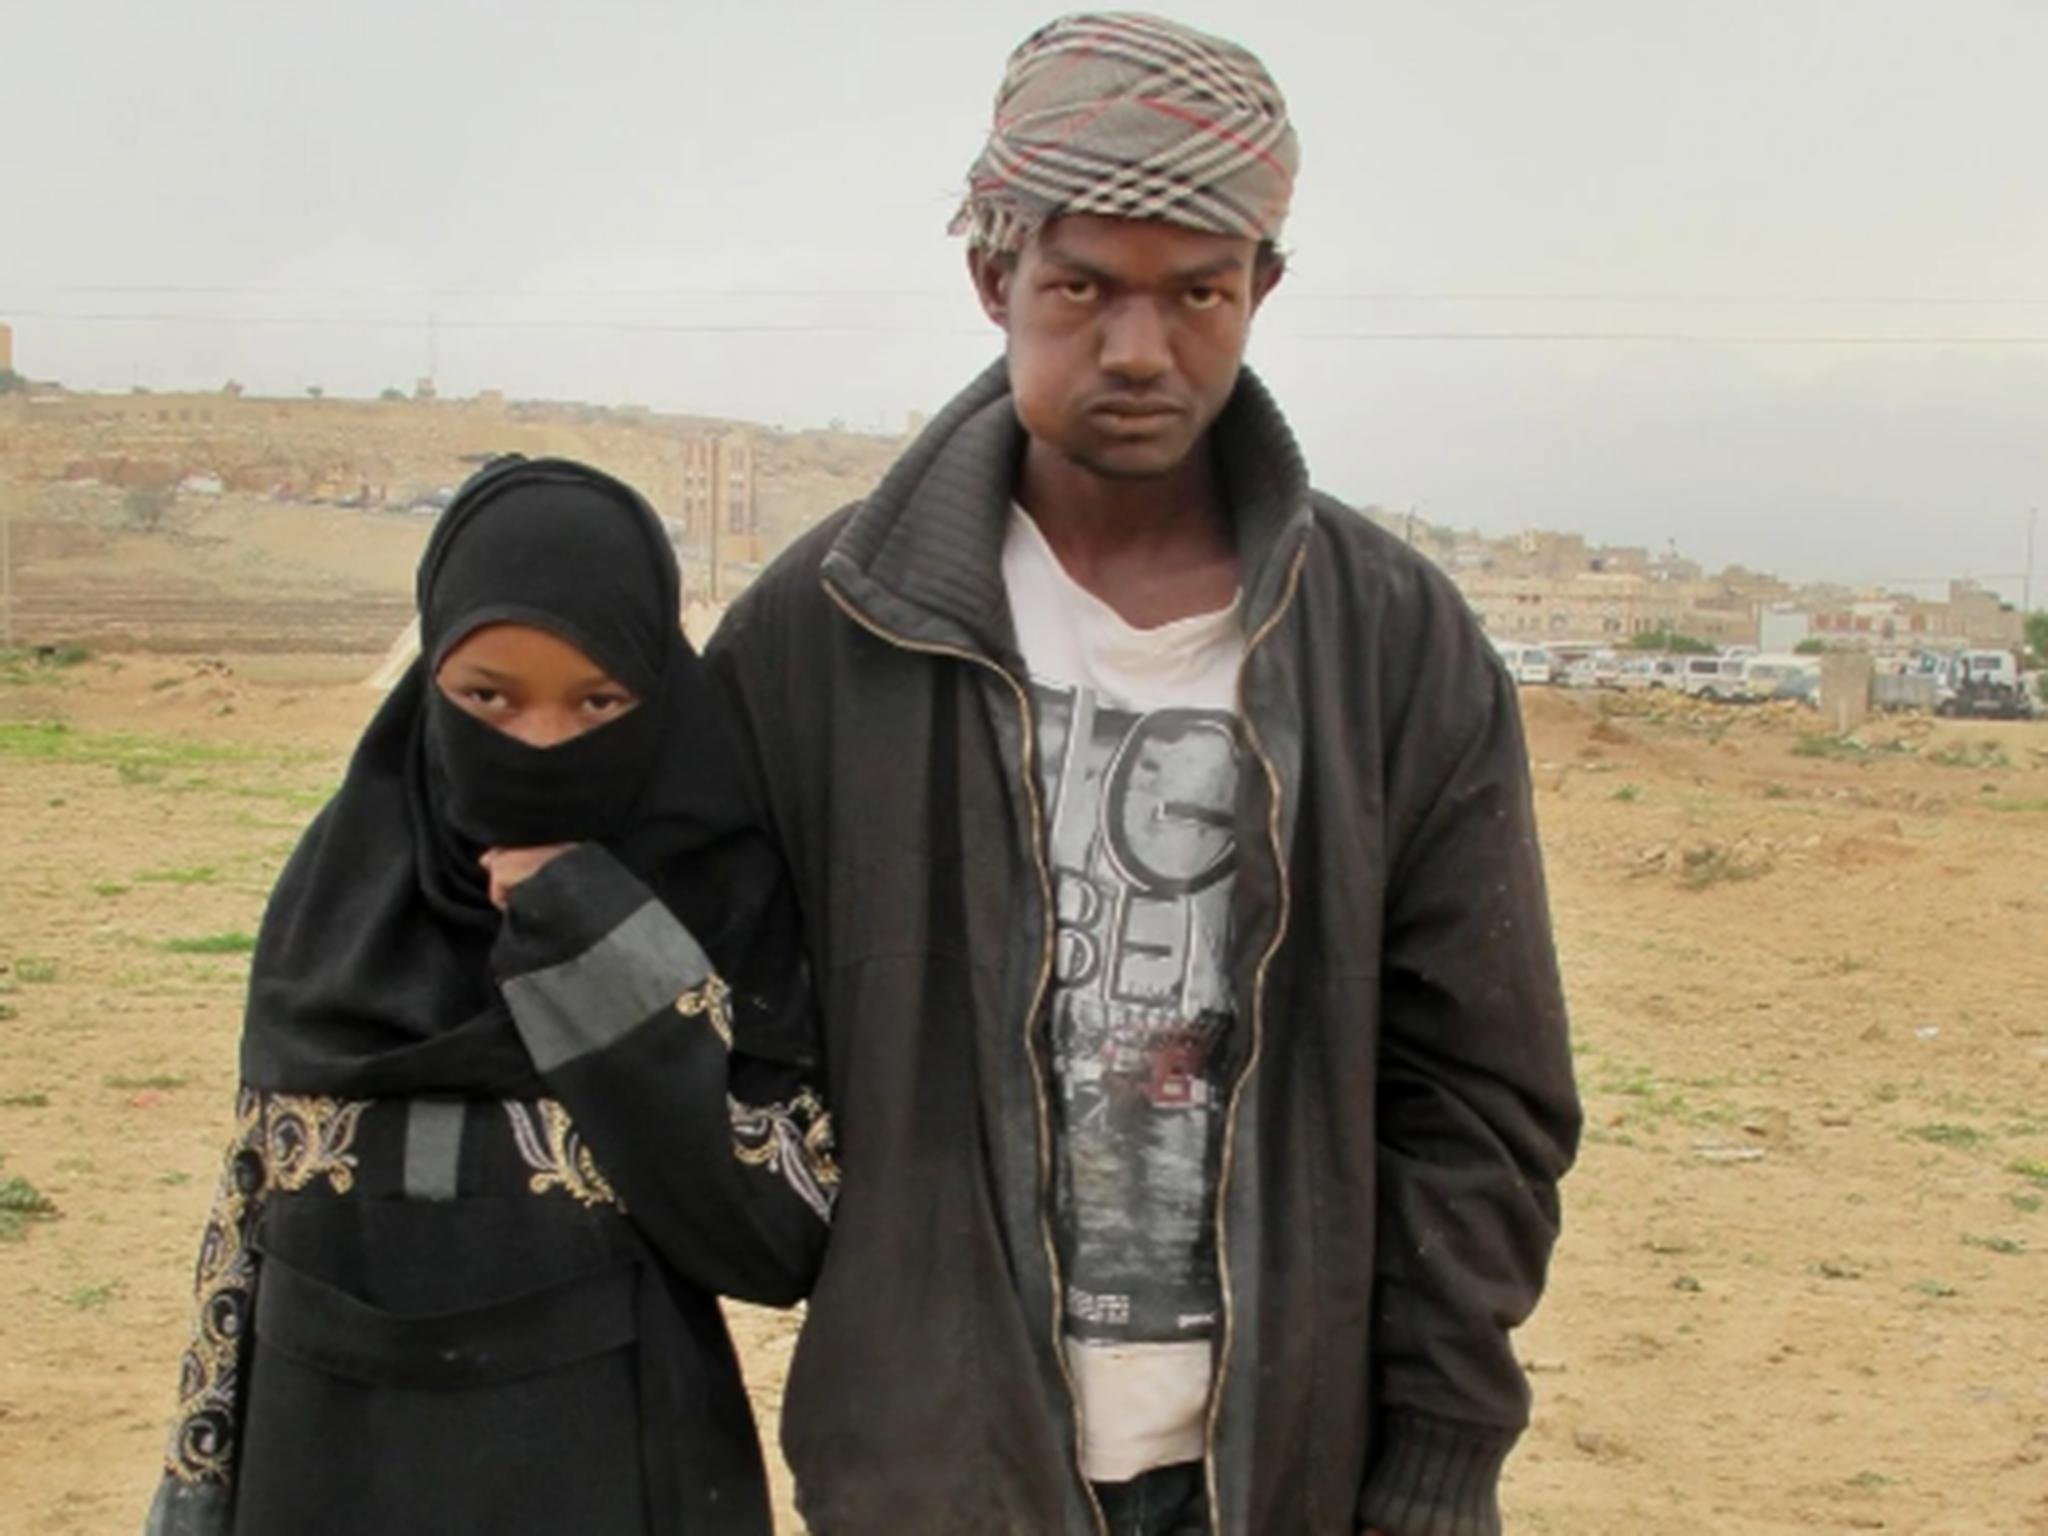 For Foreign Wives Of Saudi Arabian Men, Legal Limbo Sometimes Awaits